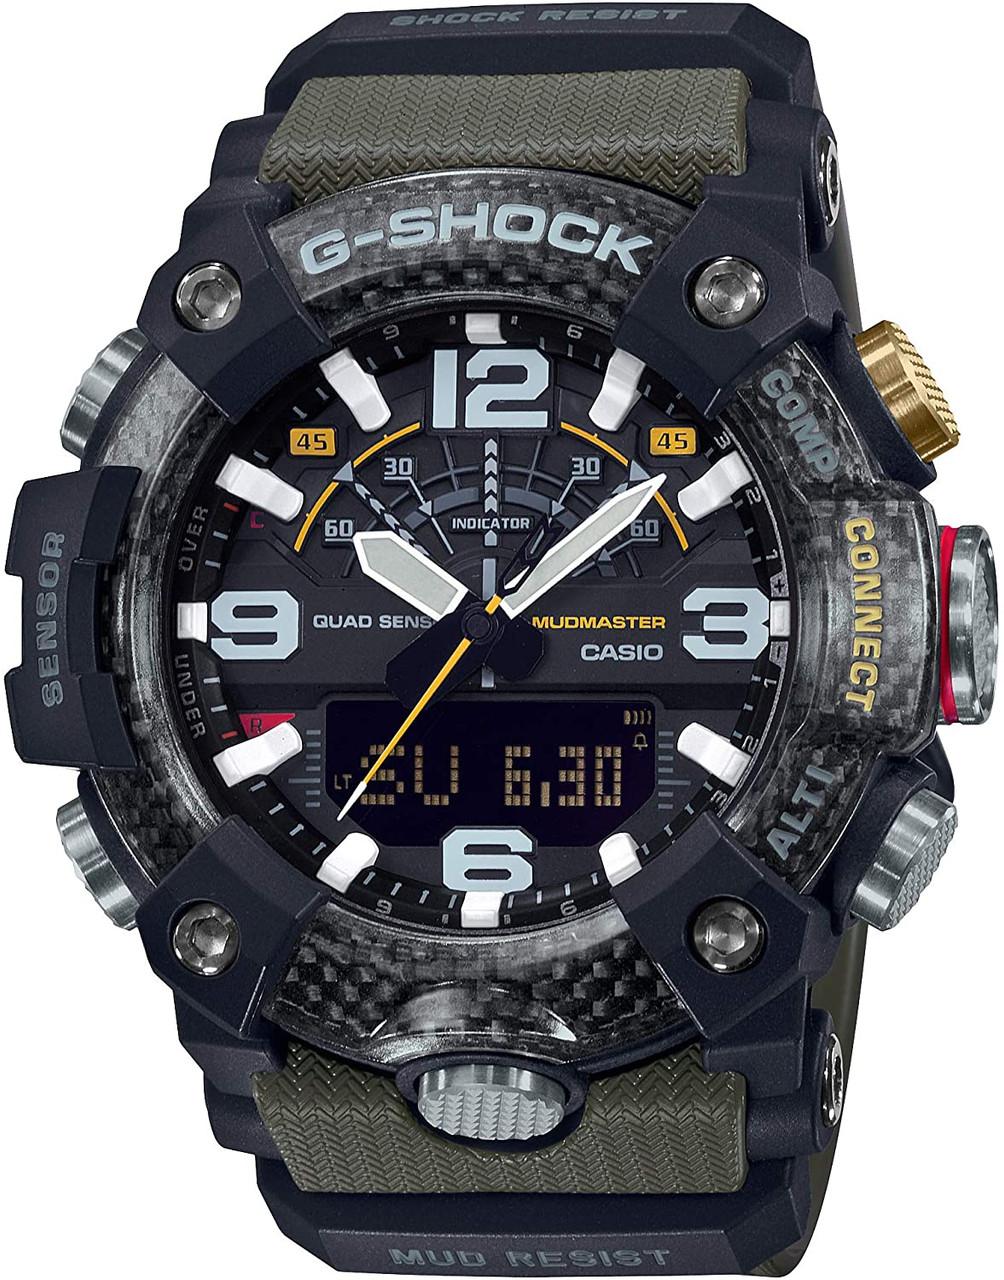 G-Shock Mudmaster Quad Sensor GG-B100-1A3JF